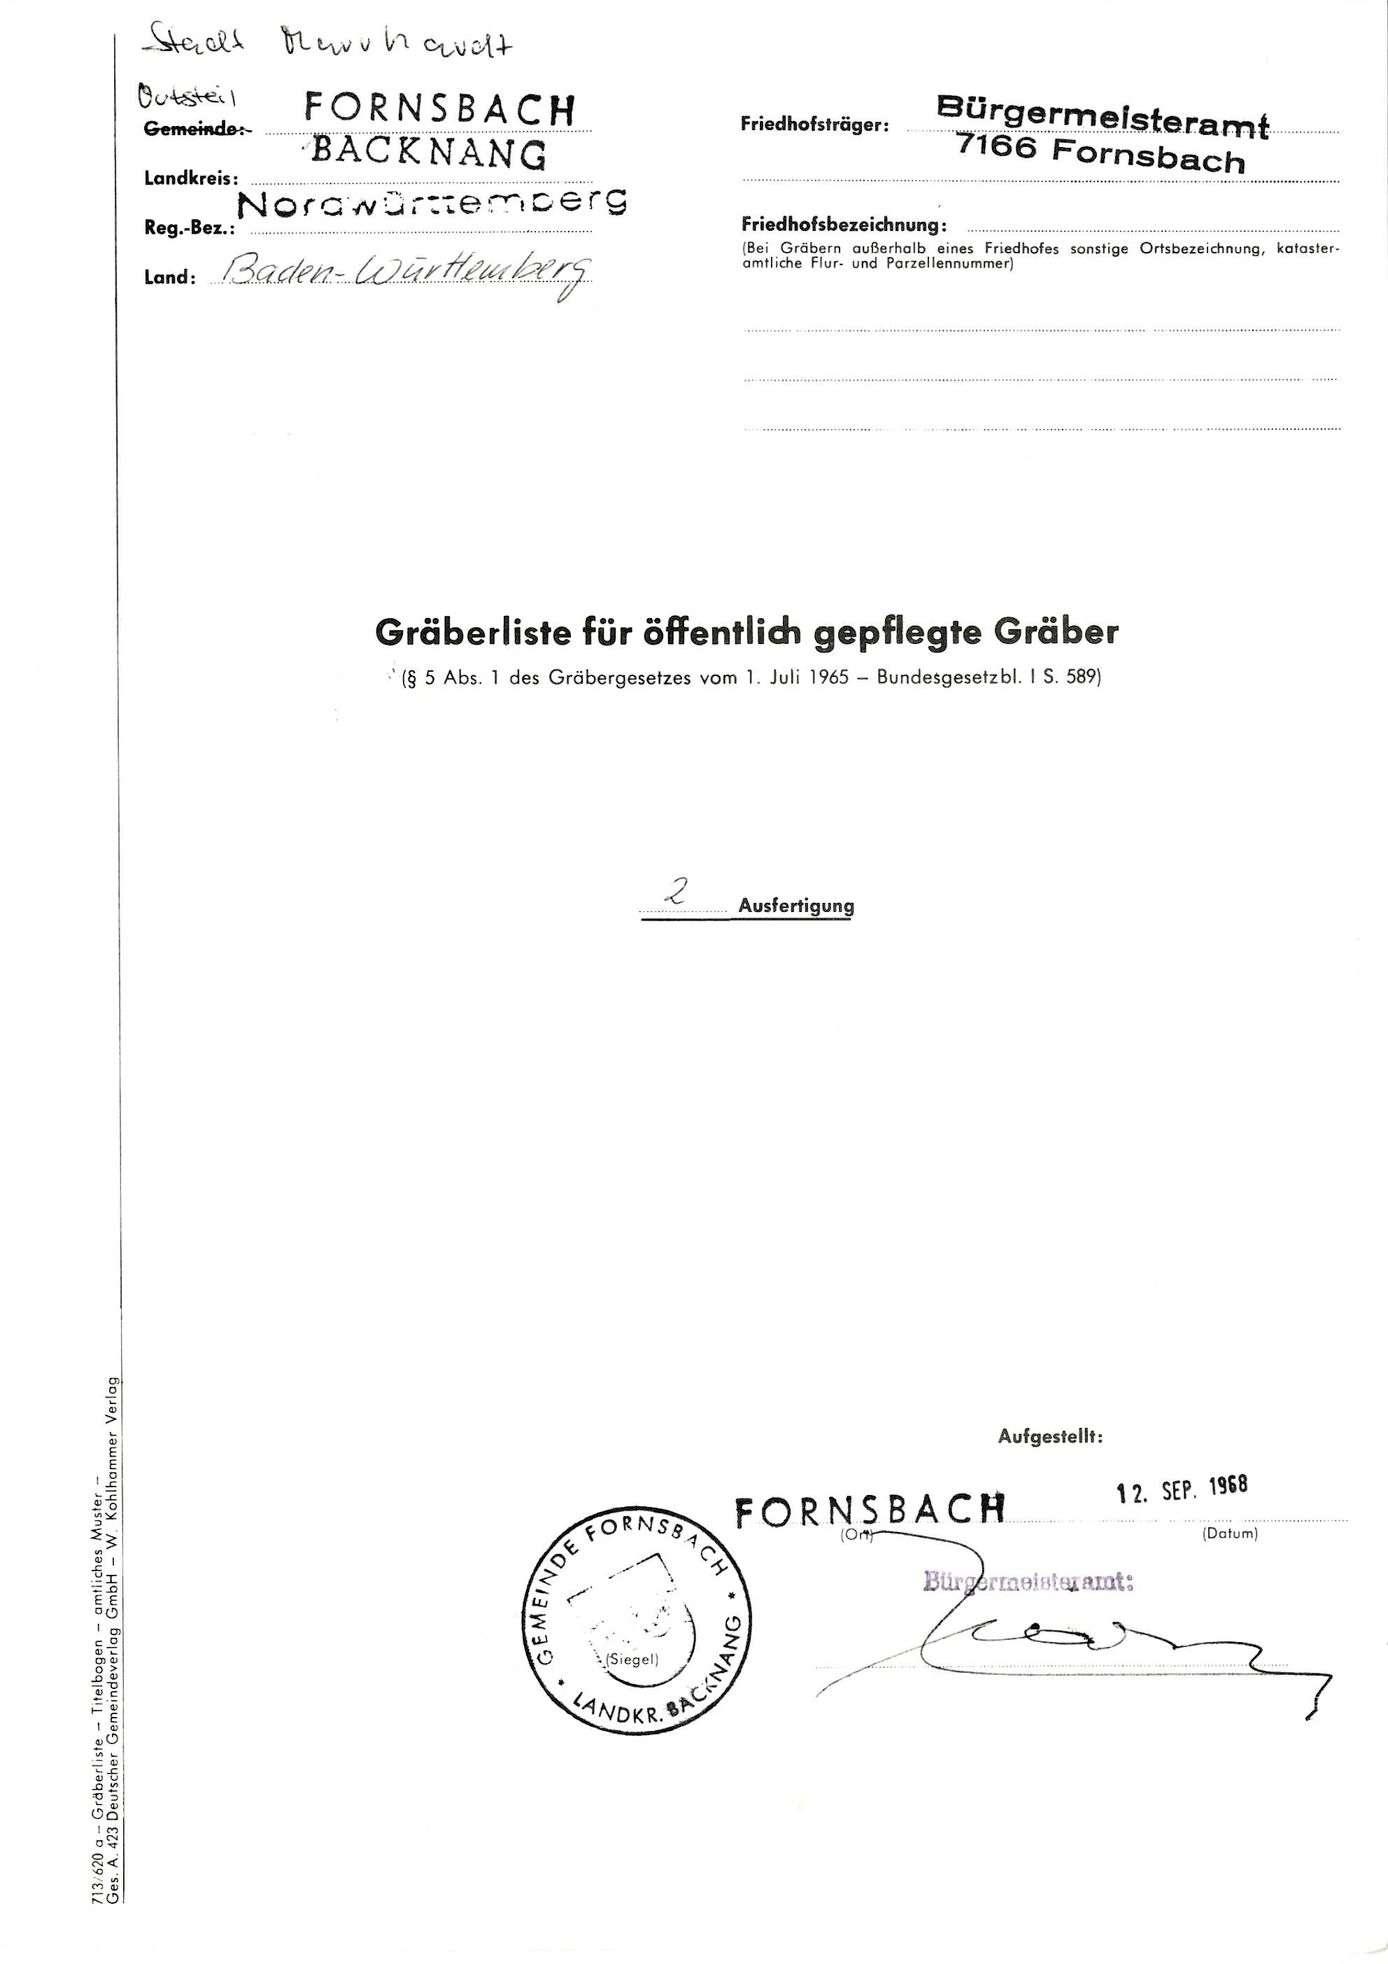 Fornsbach, Bild 1